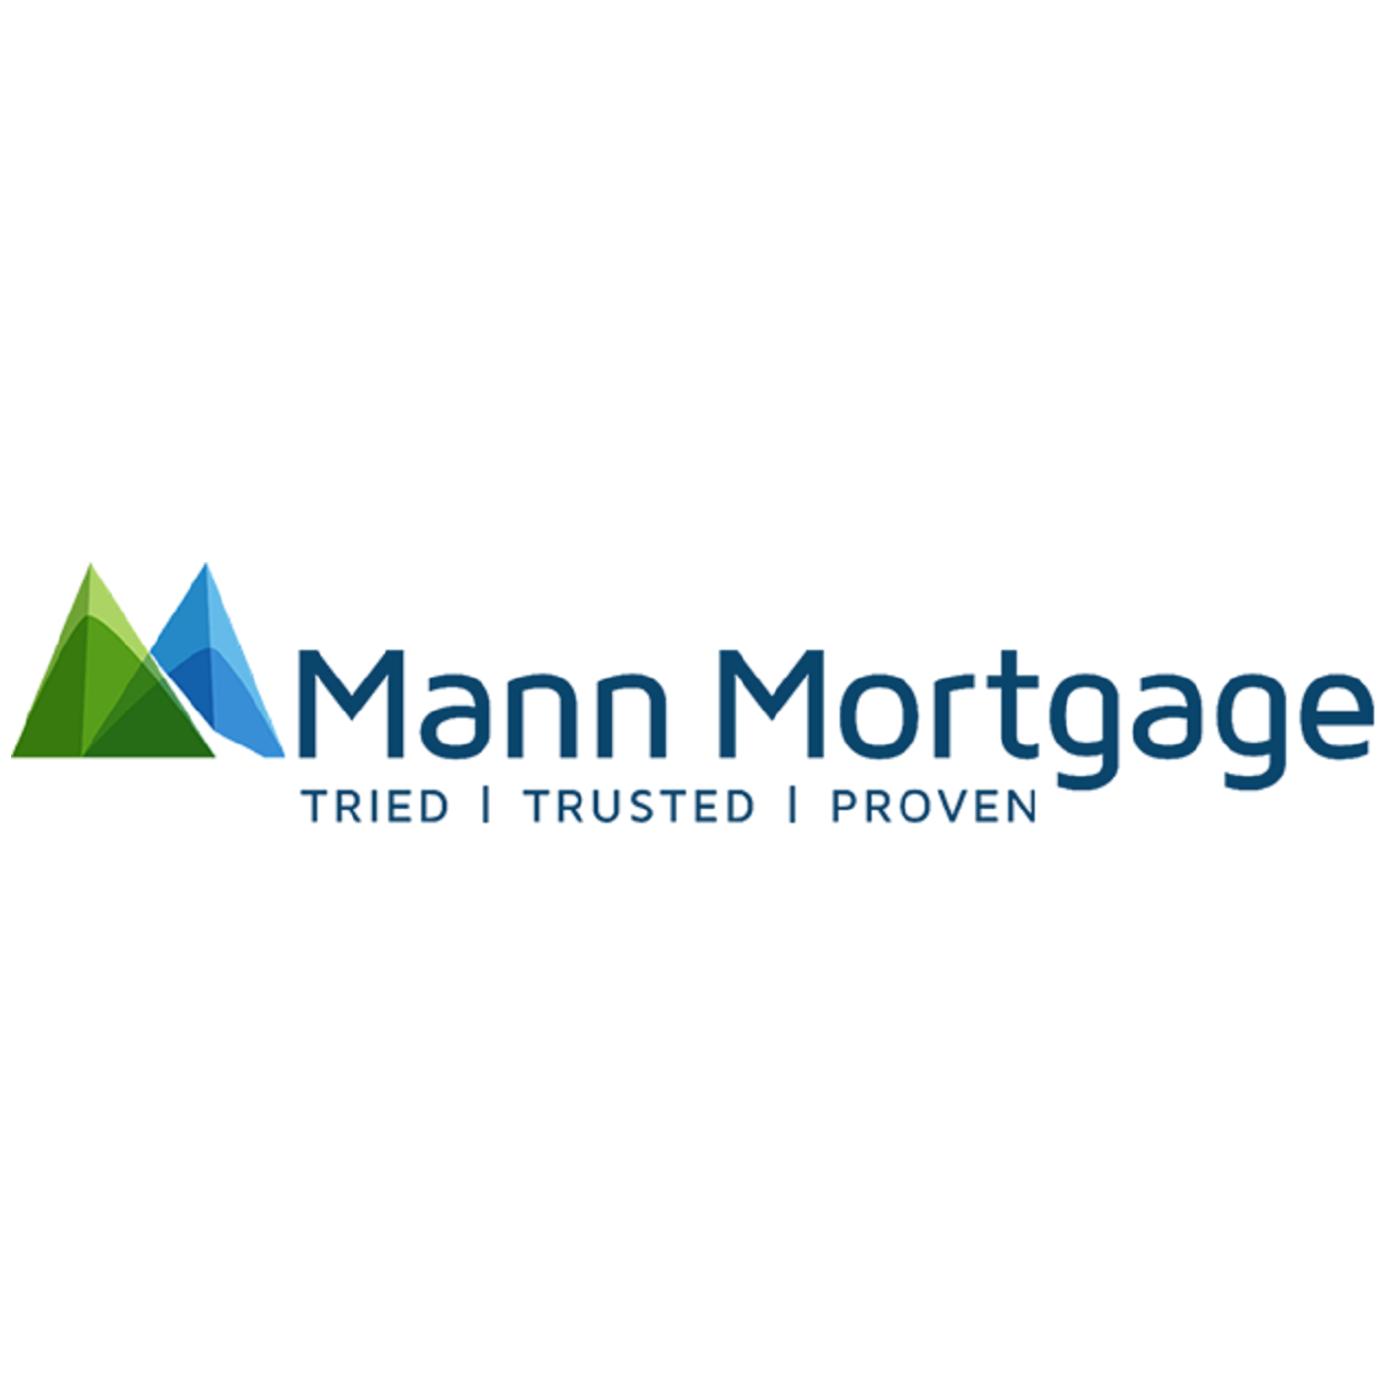 Mann Mortgage image 1